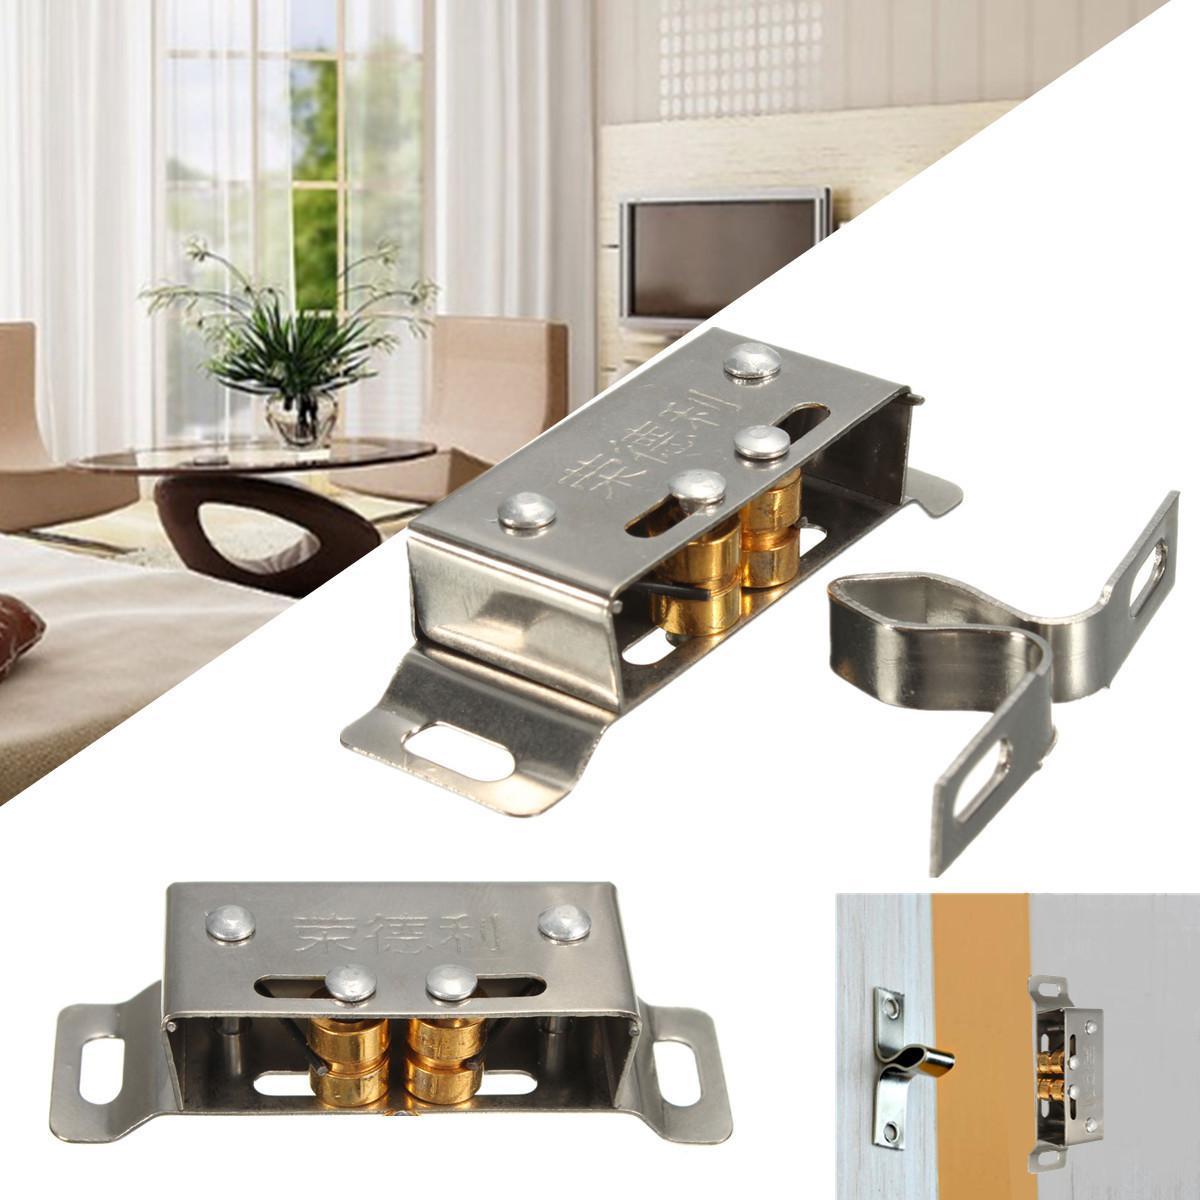 1510 Stainless Steel Magnetic Cupboard Cabinet Door Catch Stopper